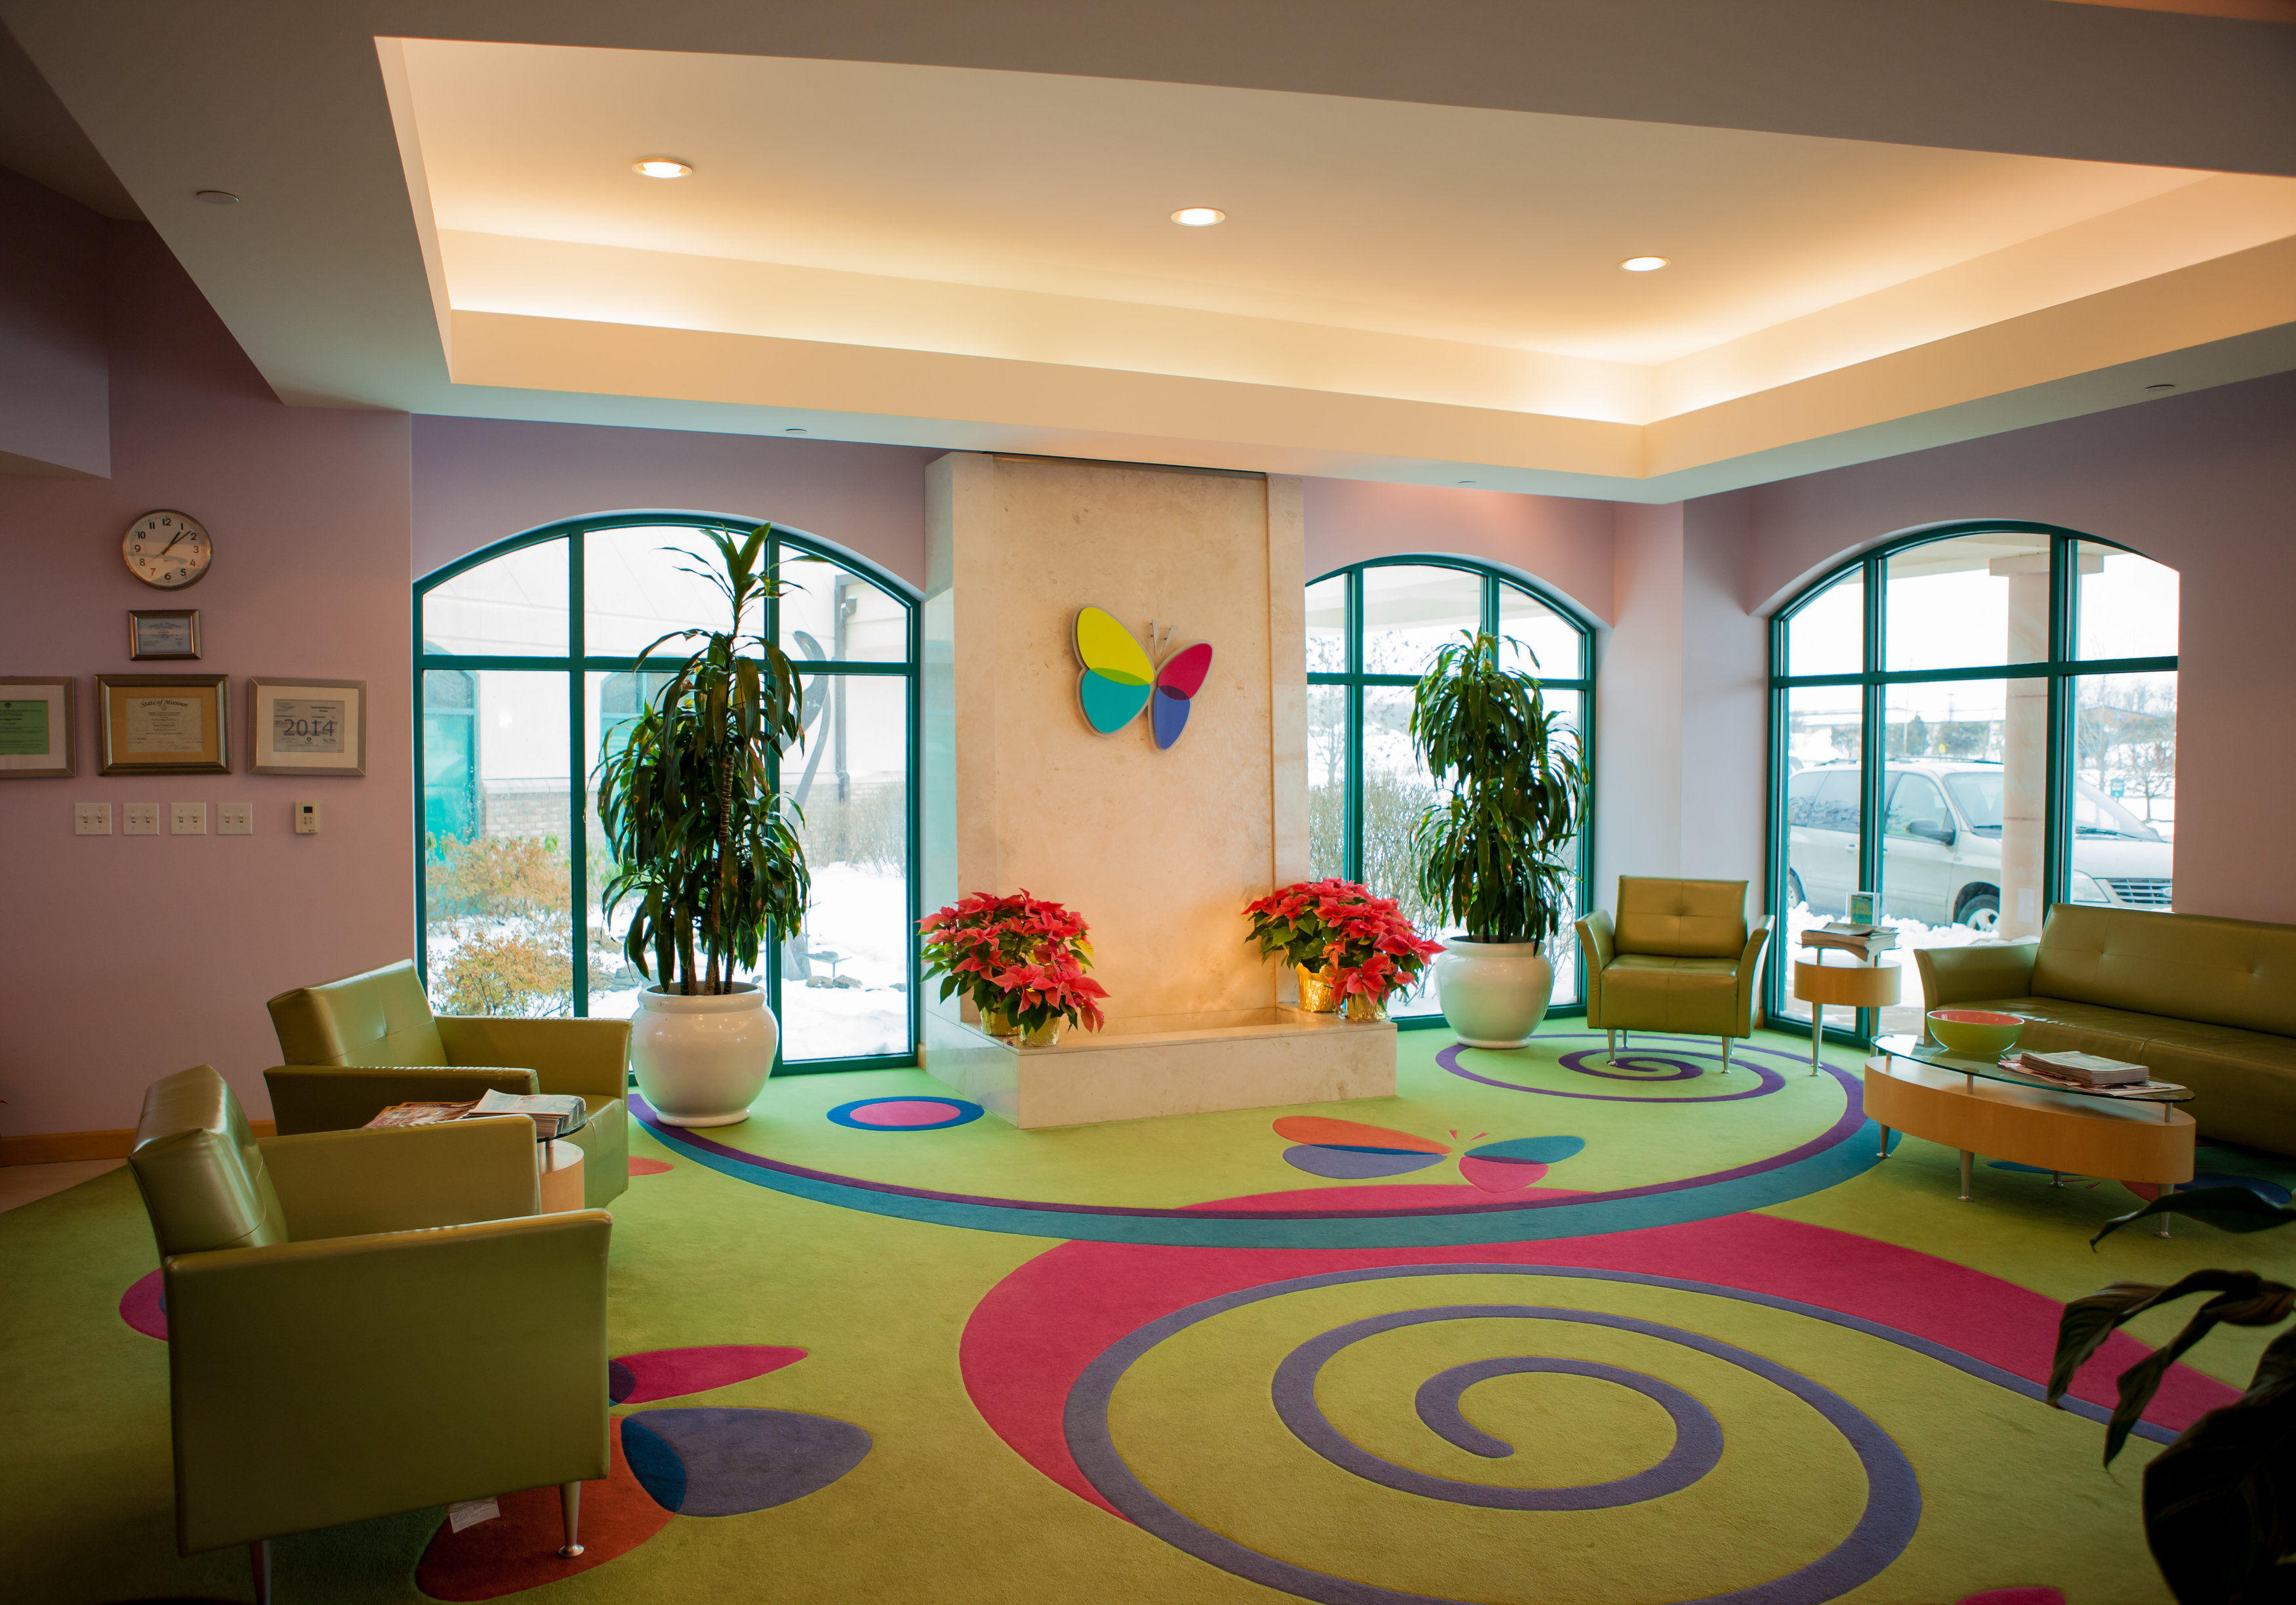 St Louis Skilled Nursing Care | Delmar Gardens of O\'Fallon